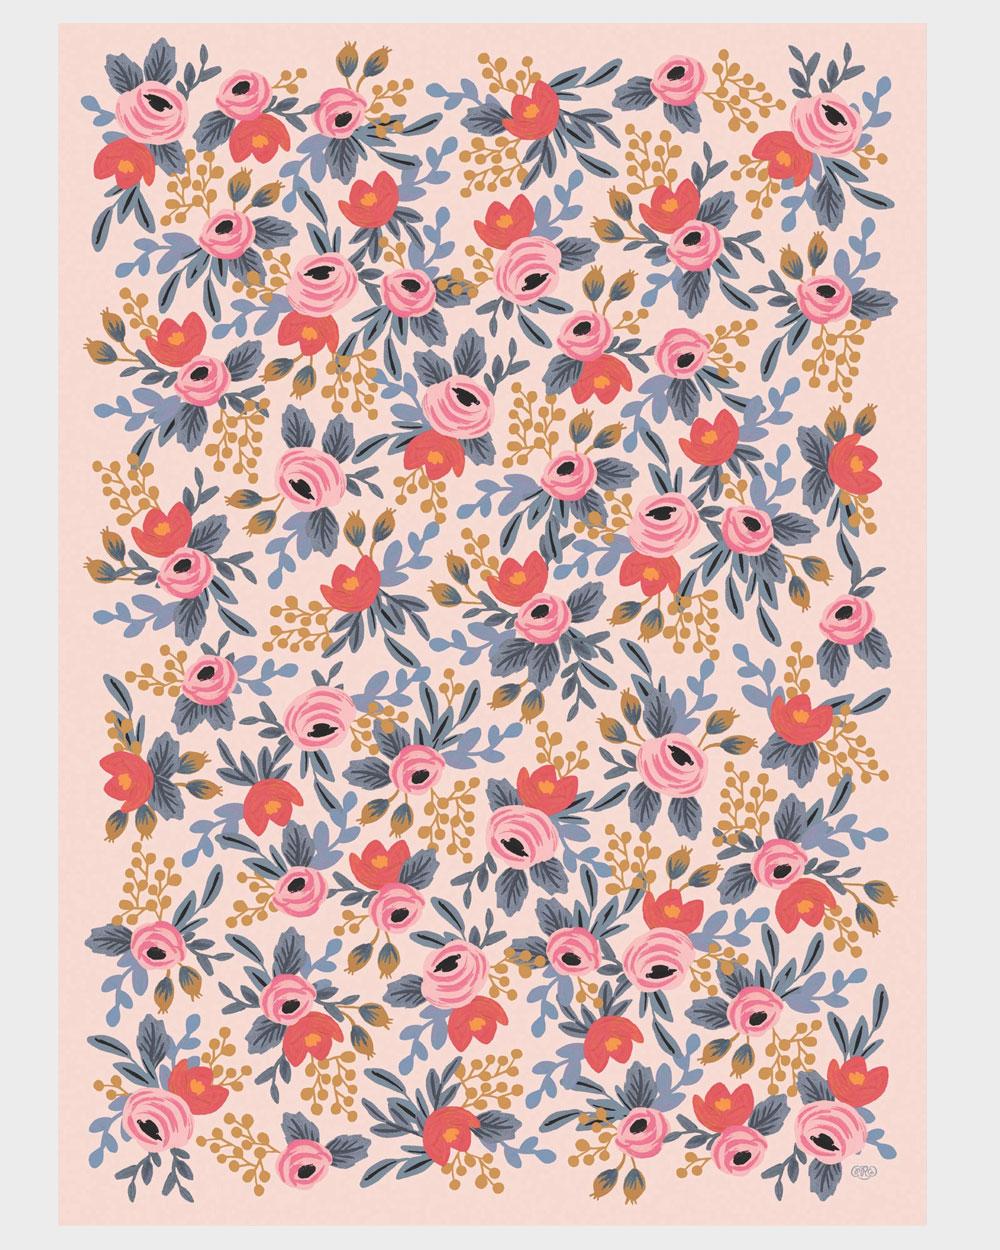 Blushing rosa lahjapaperi